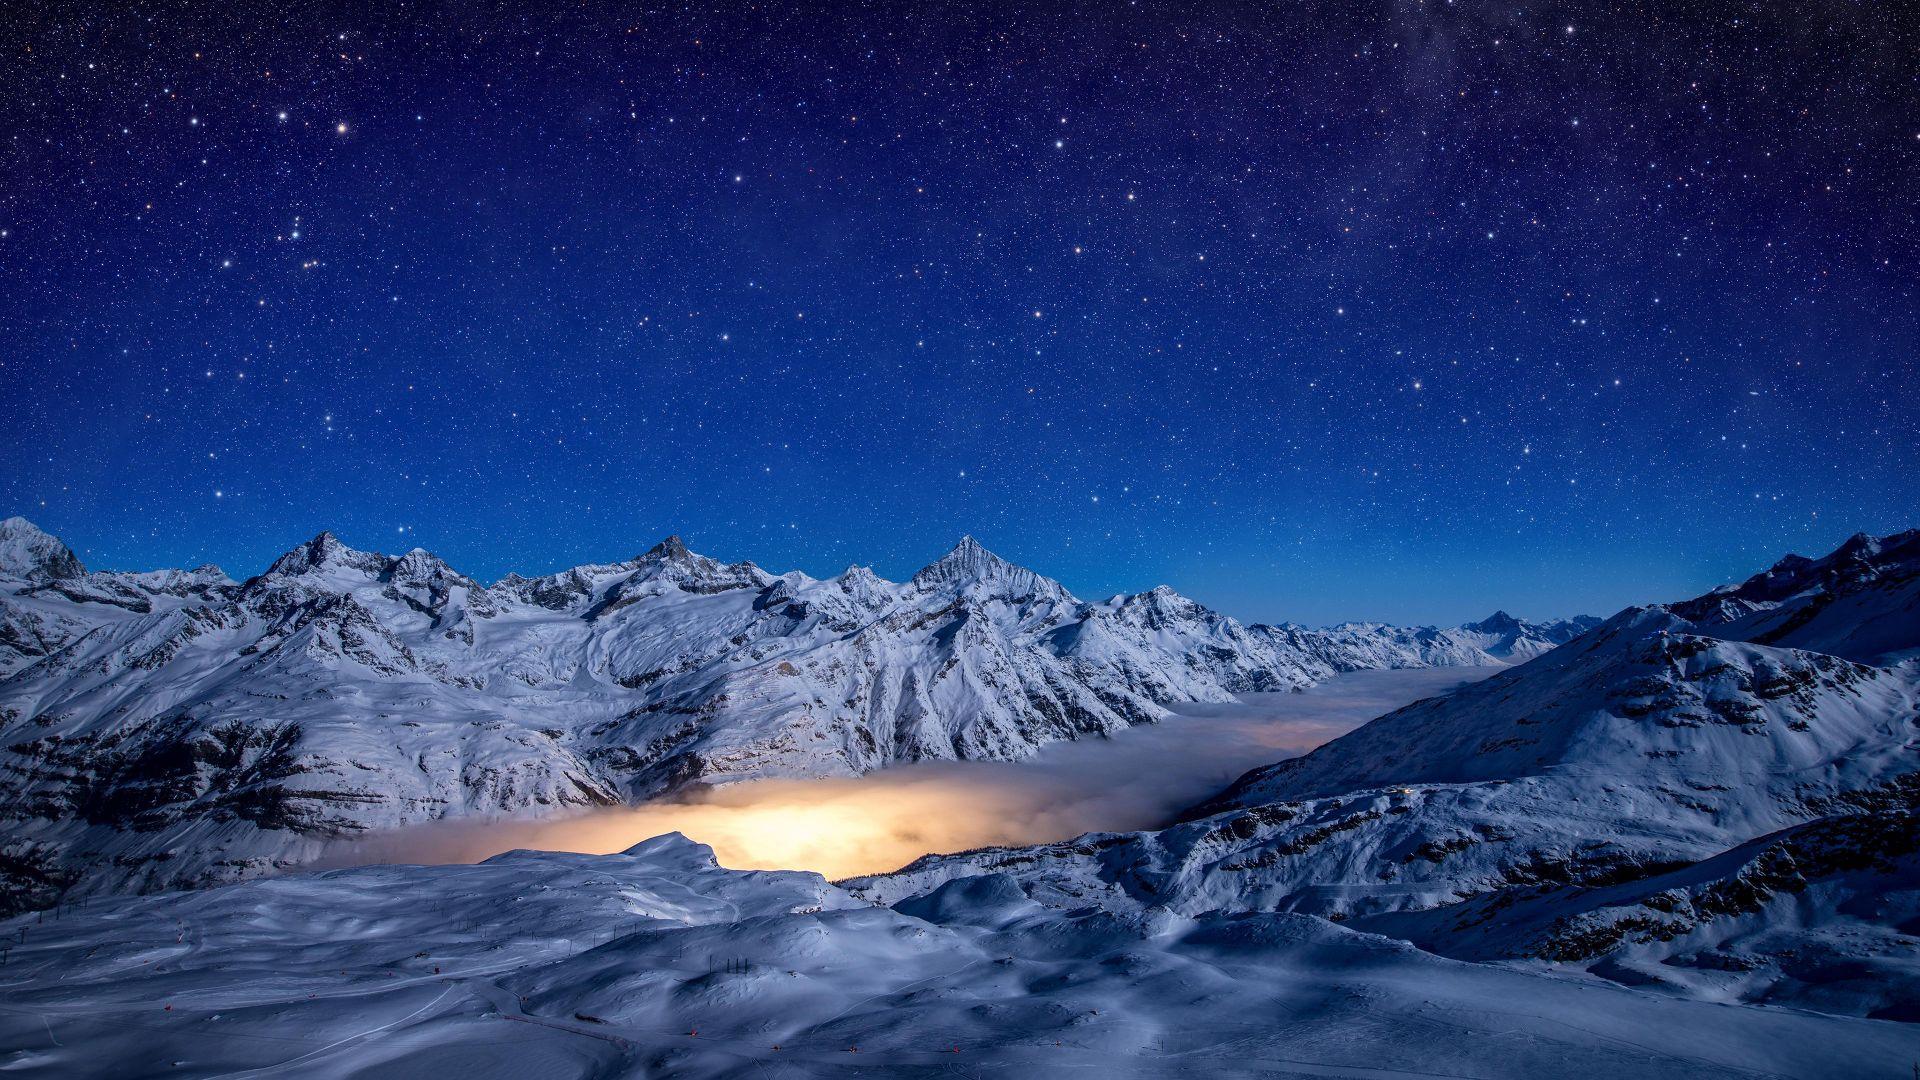 Wallpaper night, mountains, sky, stars, 4k, Nature #17796